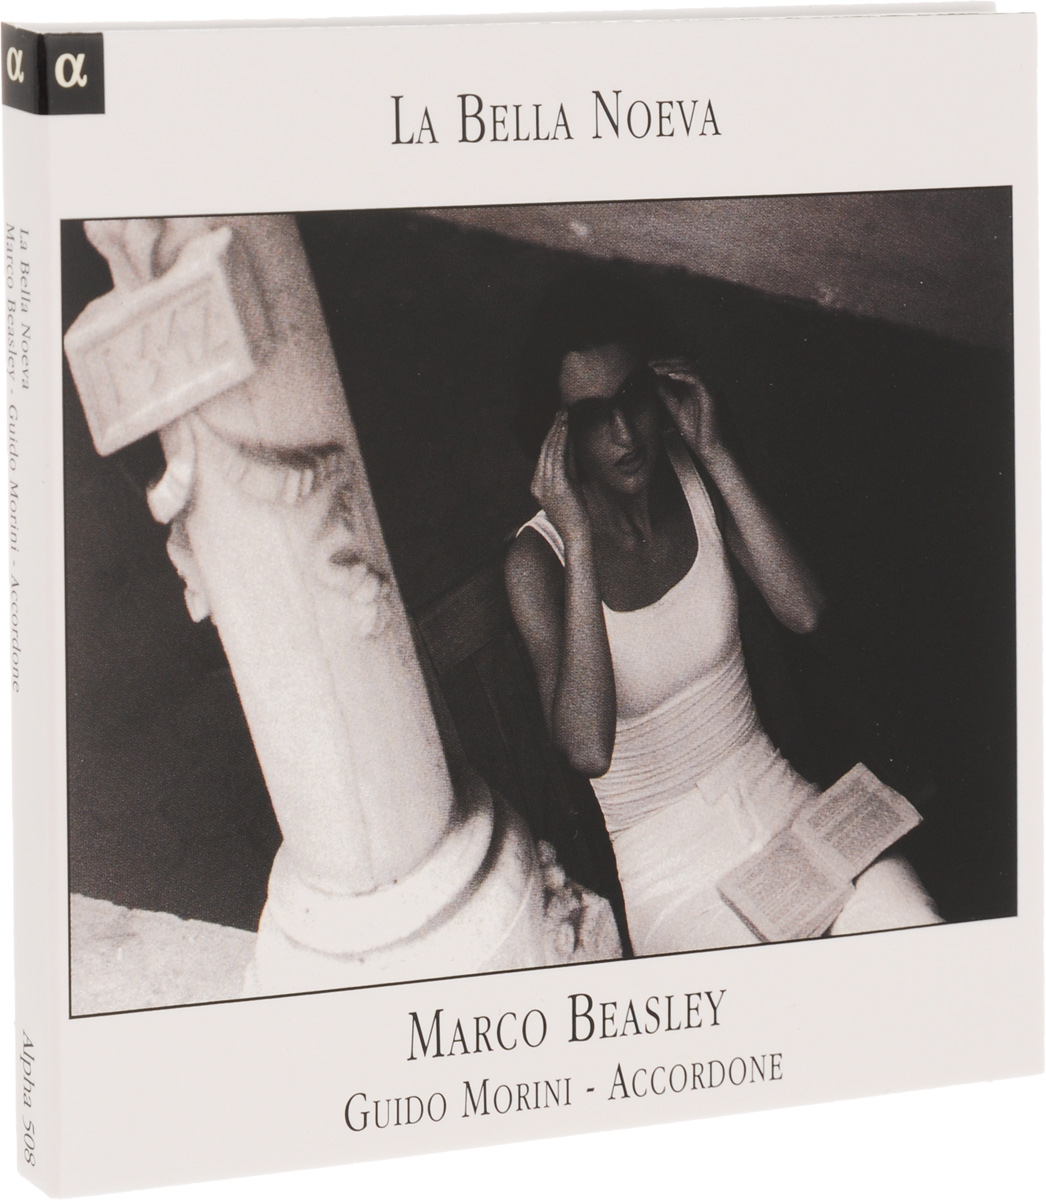 Marco Beasley. Guido Morini. La Bella Noeva